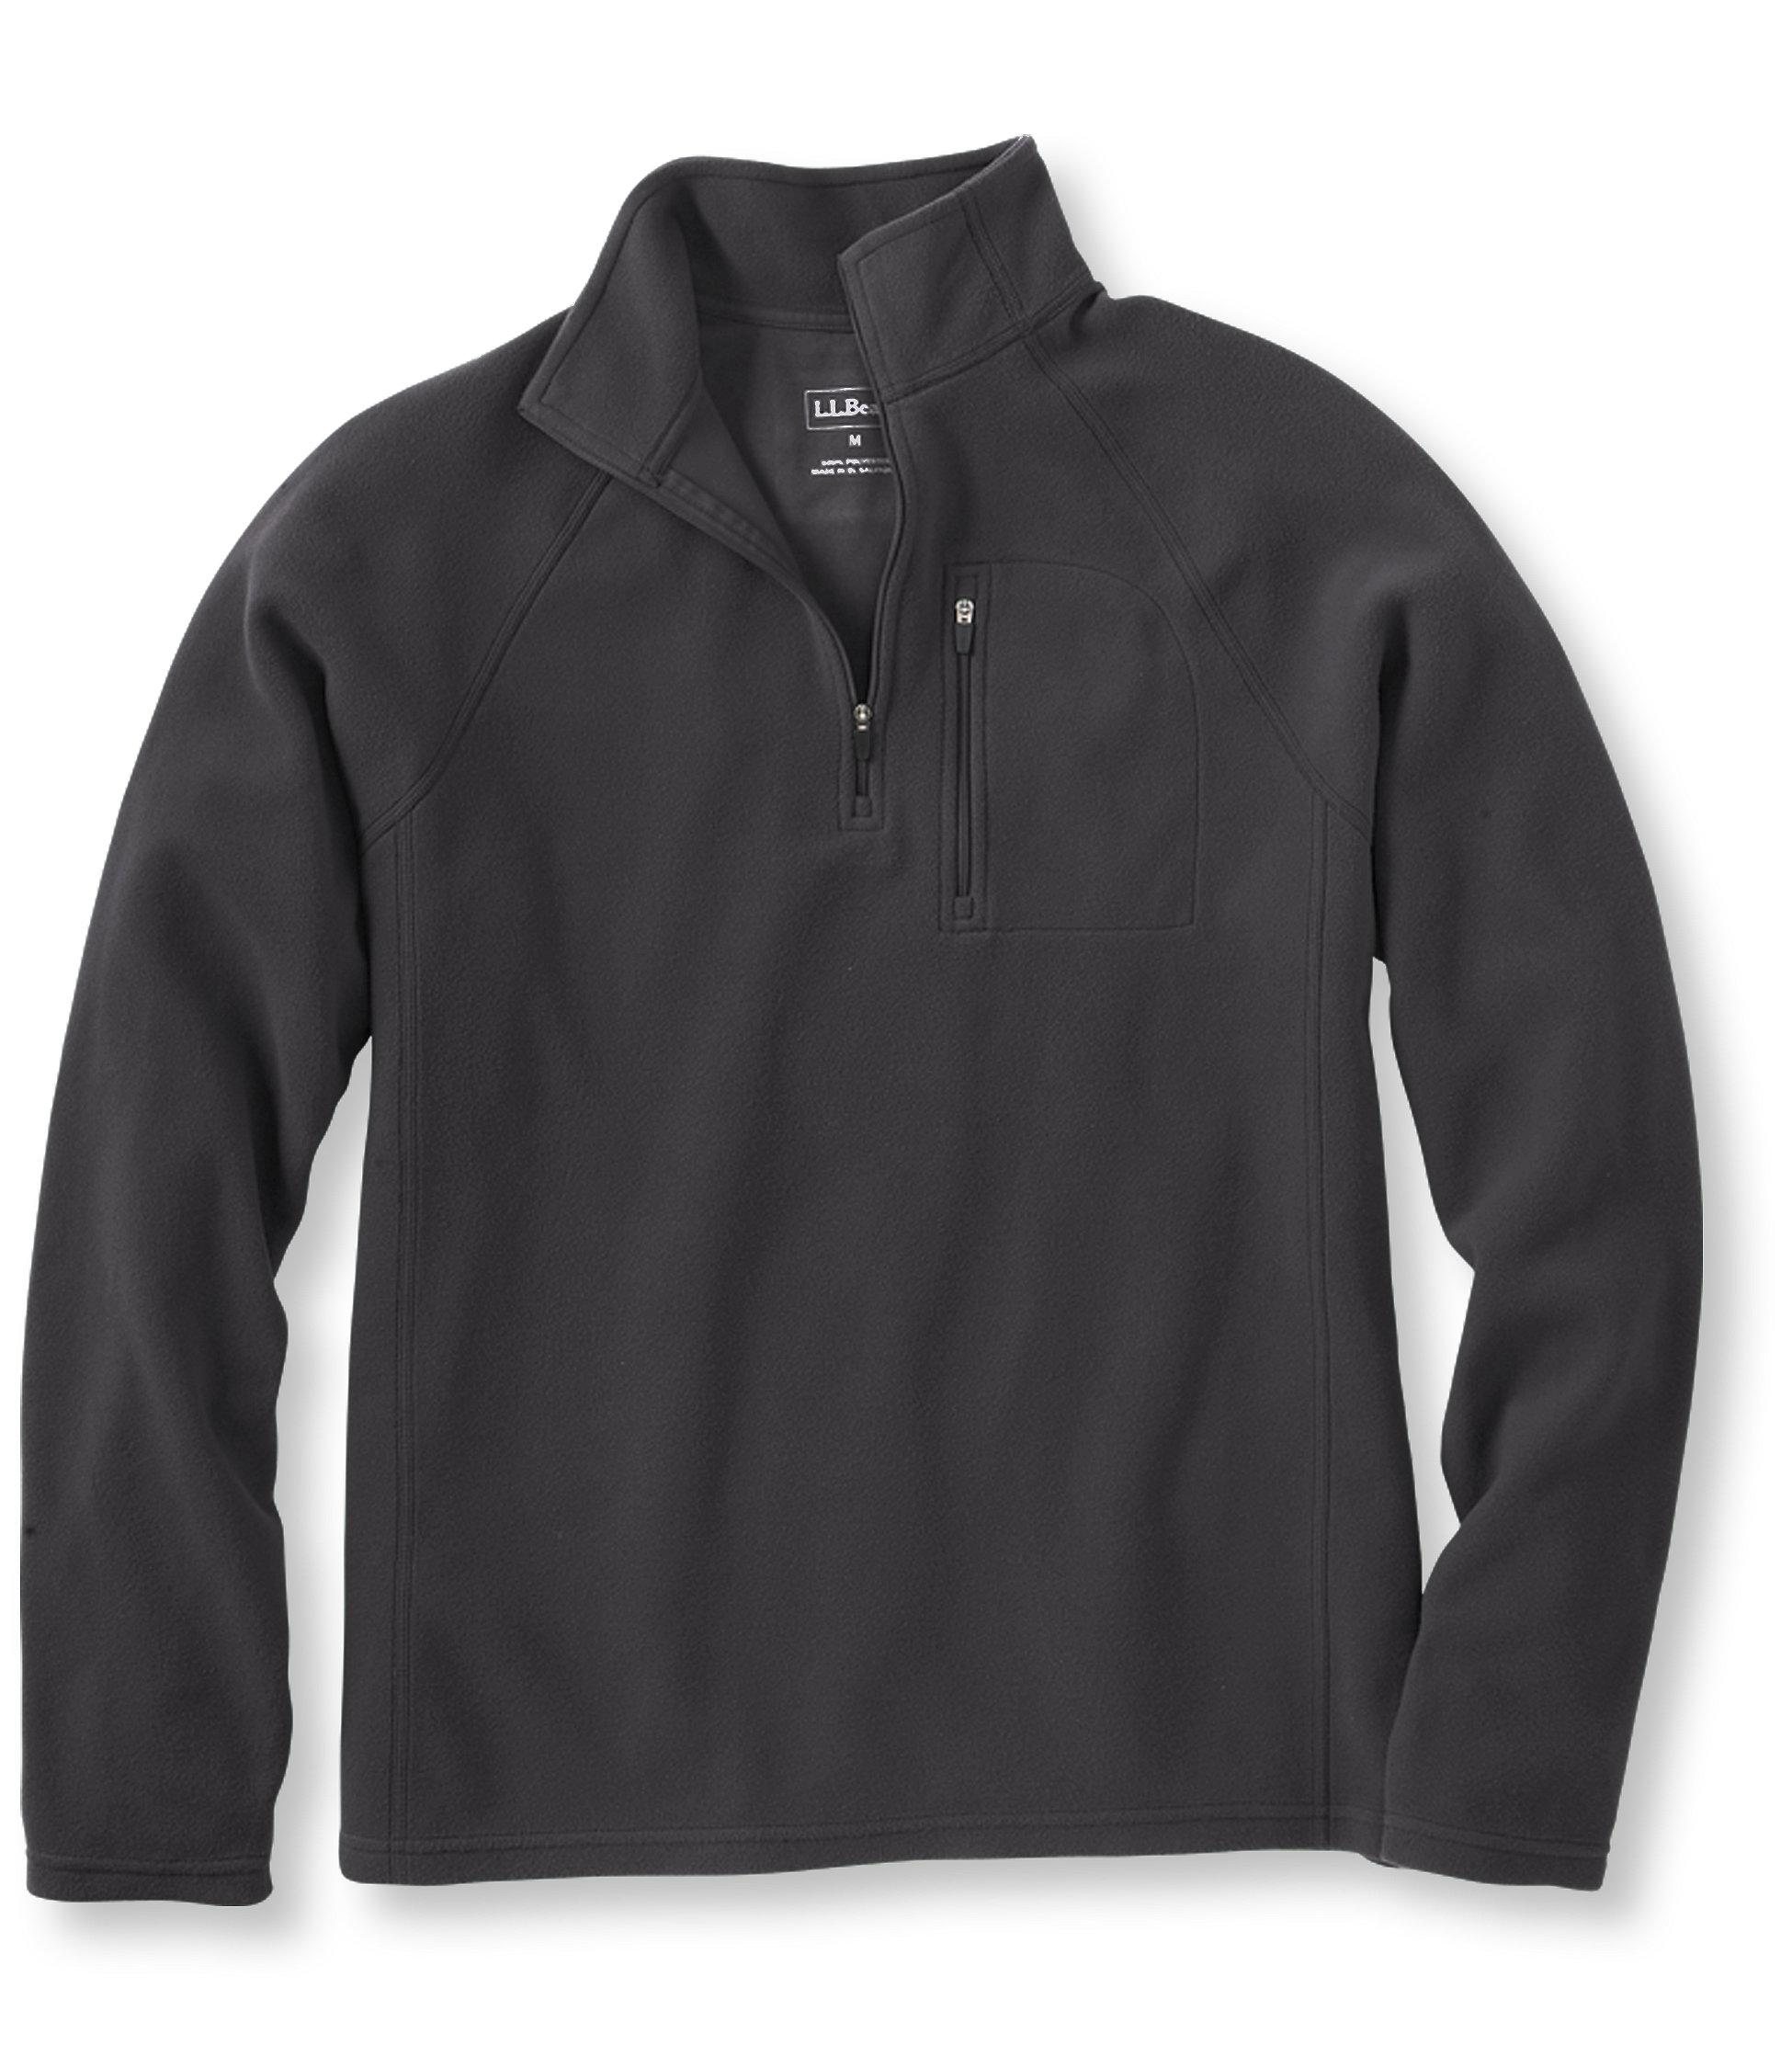 L.L.Bean Fitness Fleece, Quarter-Zip Pullover